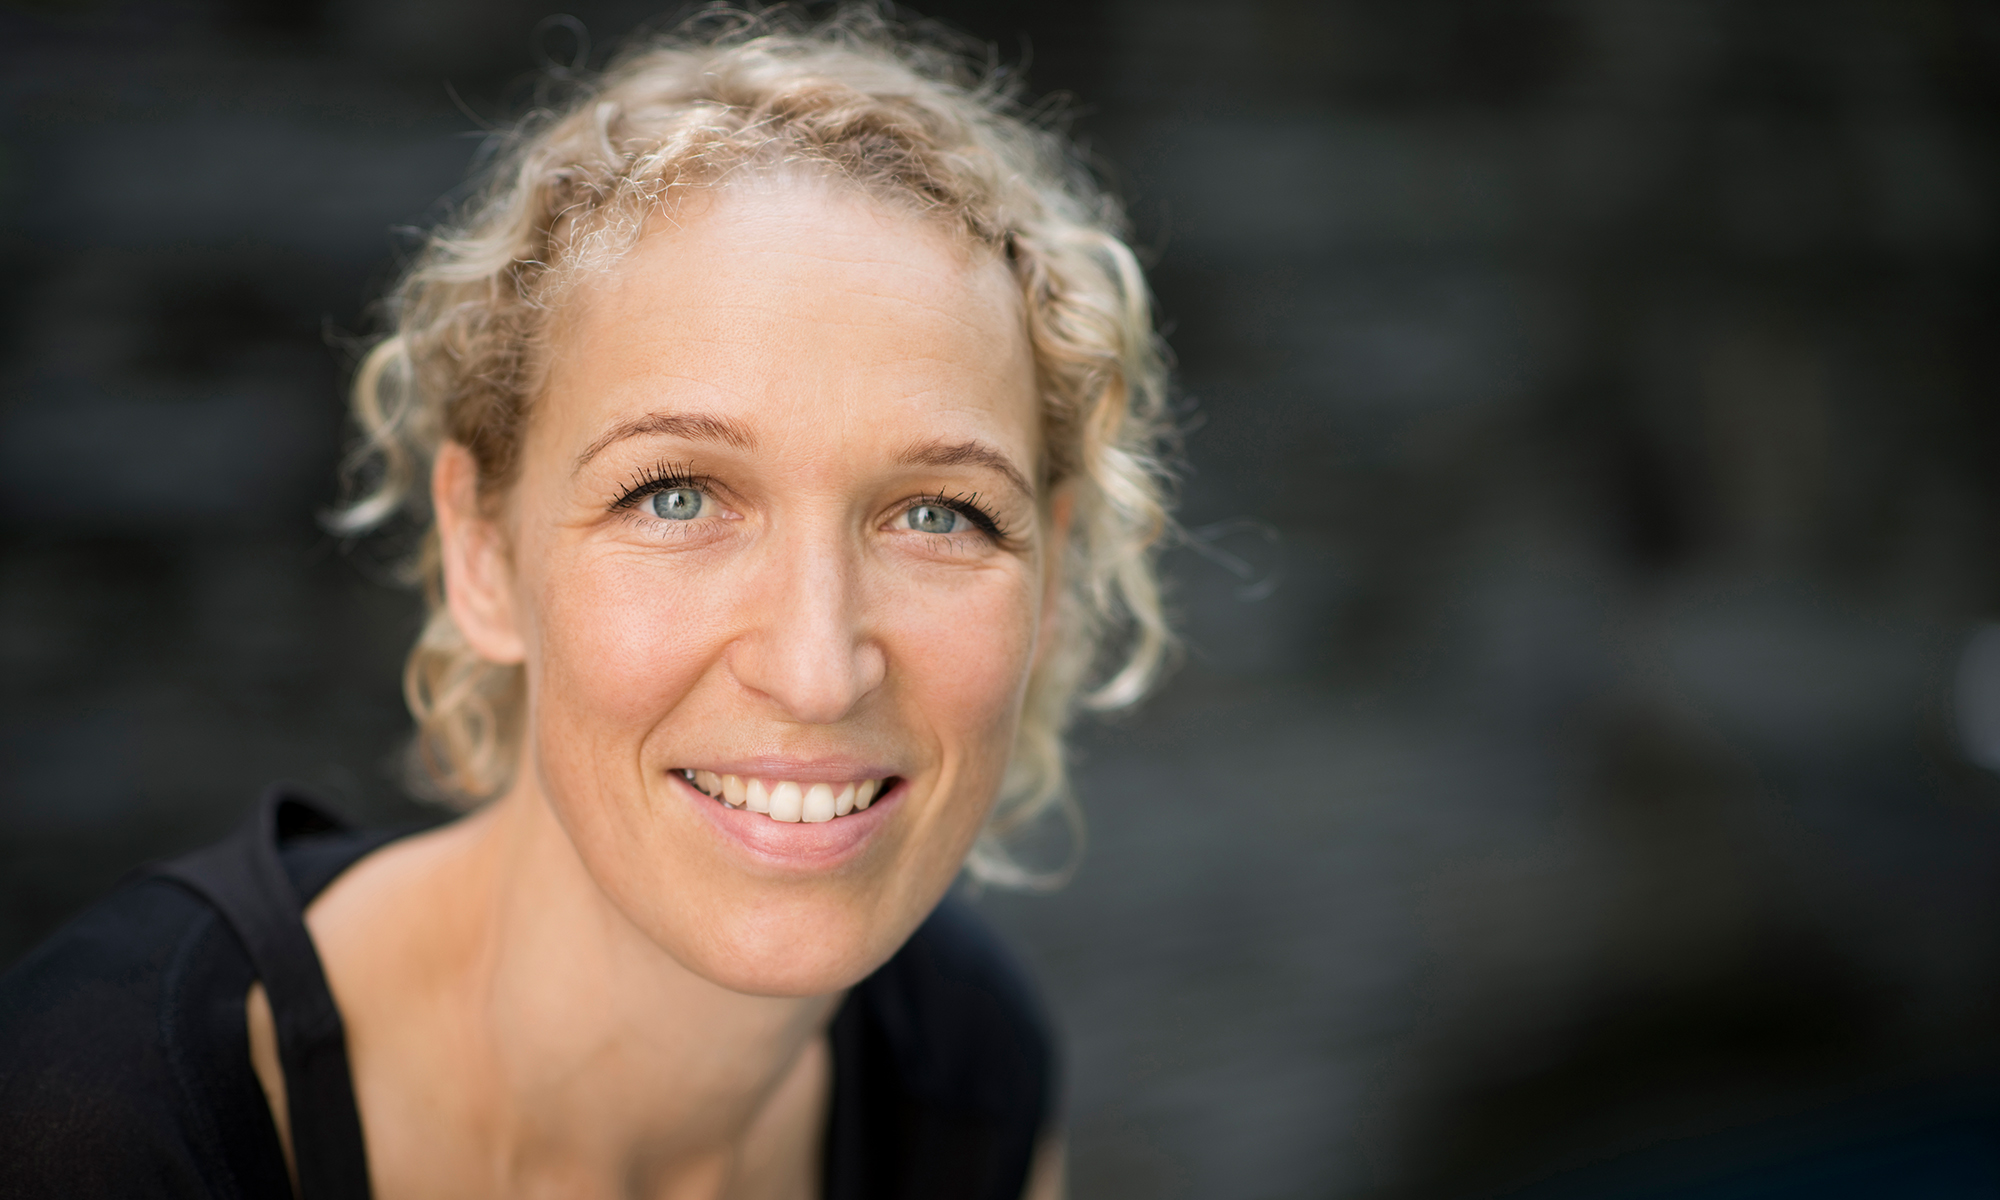 Sabine Christina Fritsch